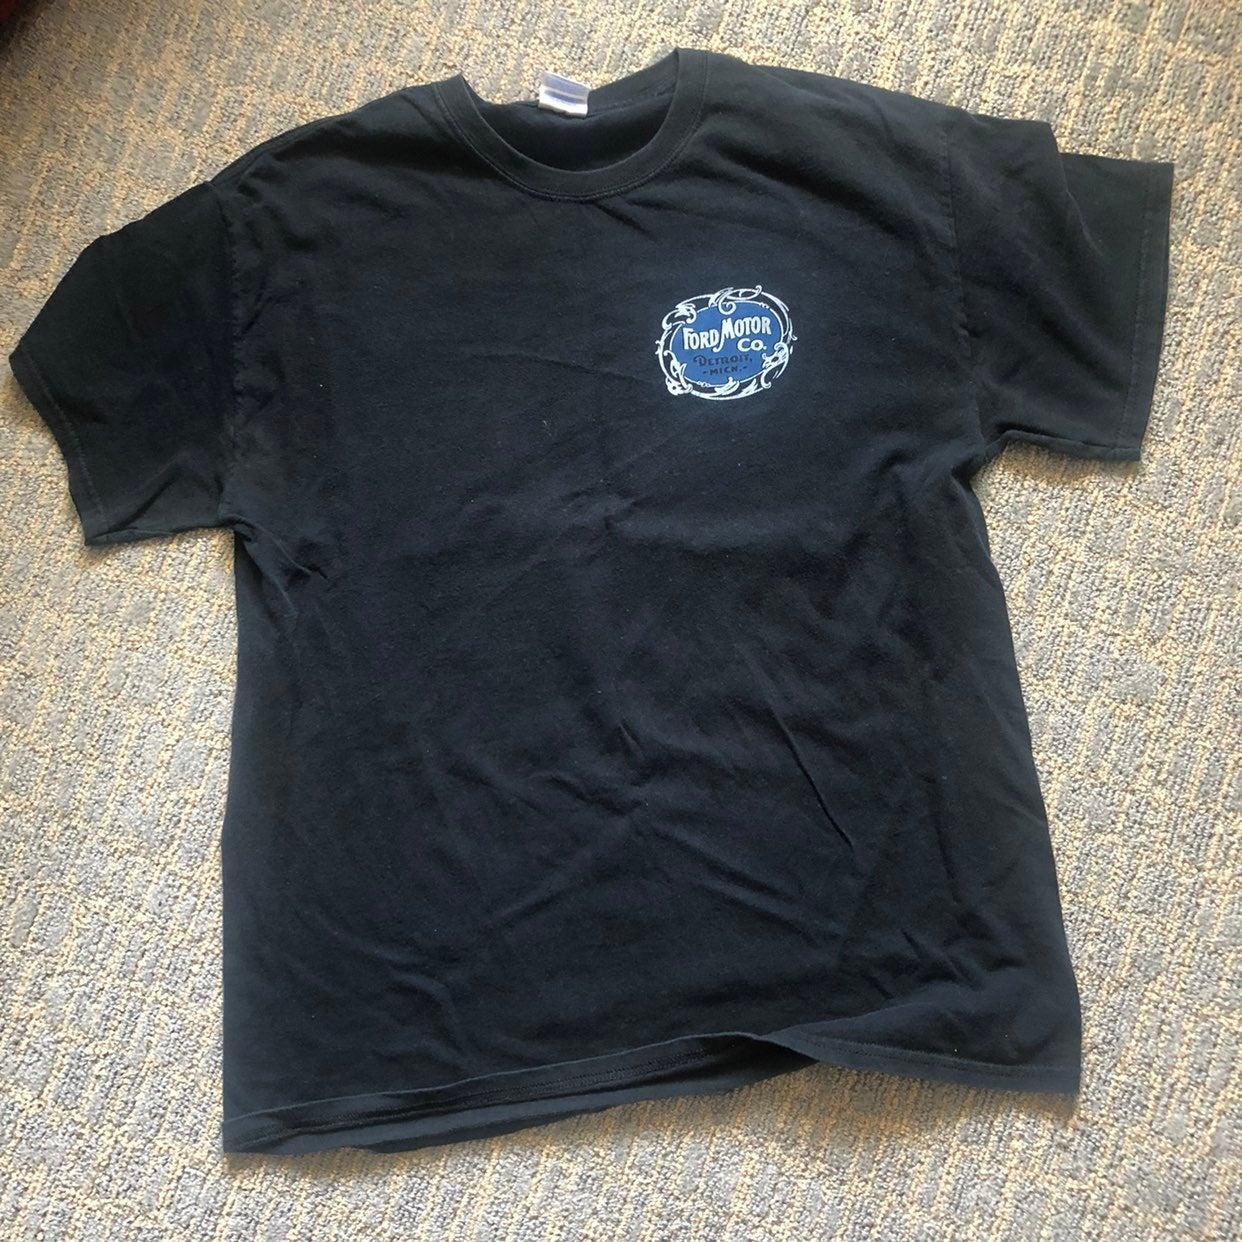 Vintage FORD MOTORS CO unisex T-shirt